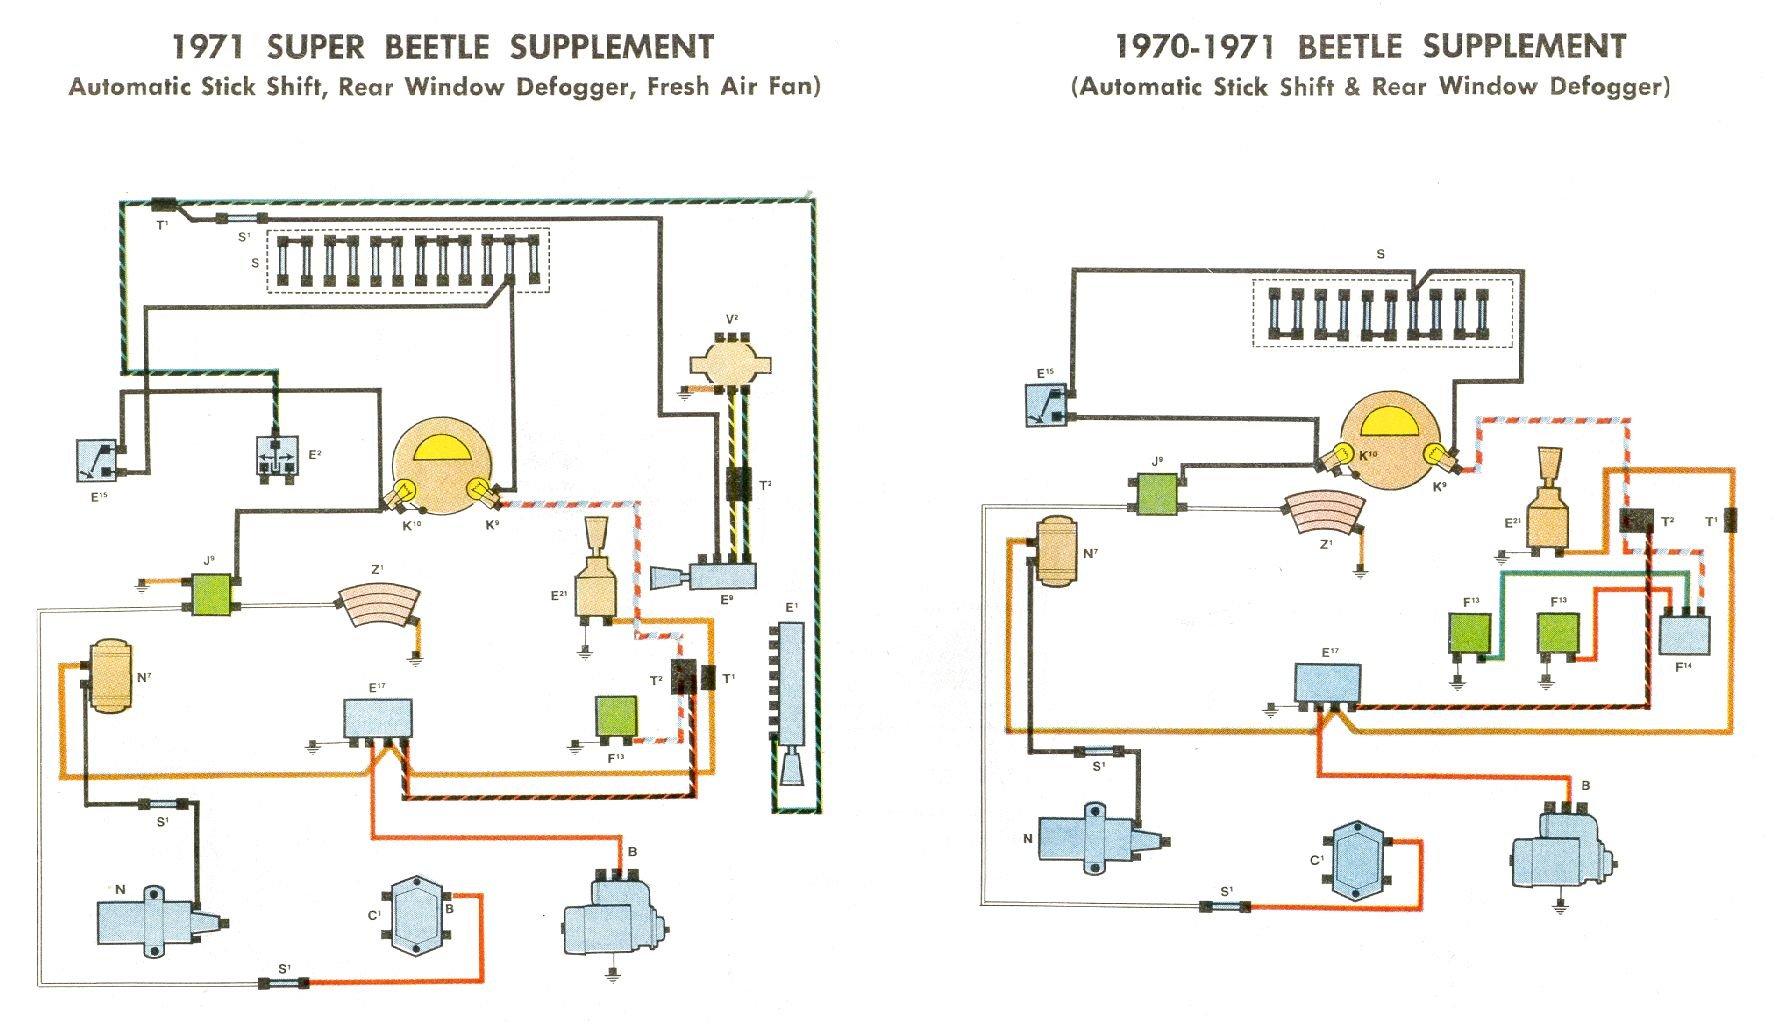 Nova Wiring Diagram Likewise Chevy Turn Signal Wiring Diagram Besides